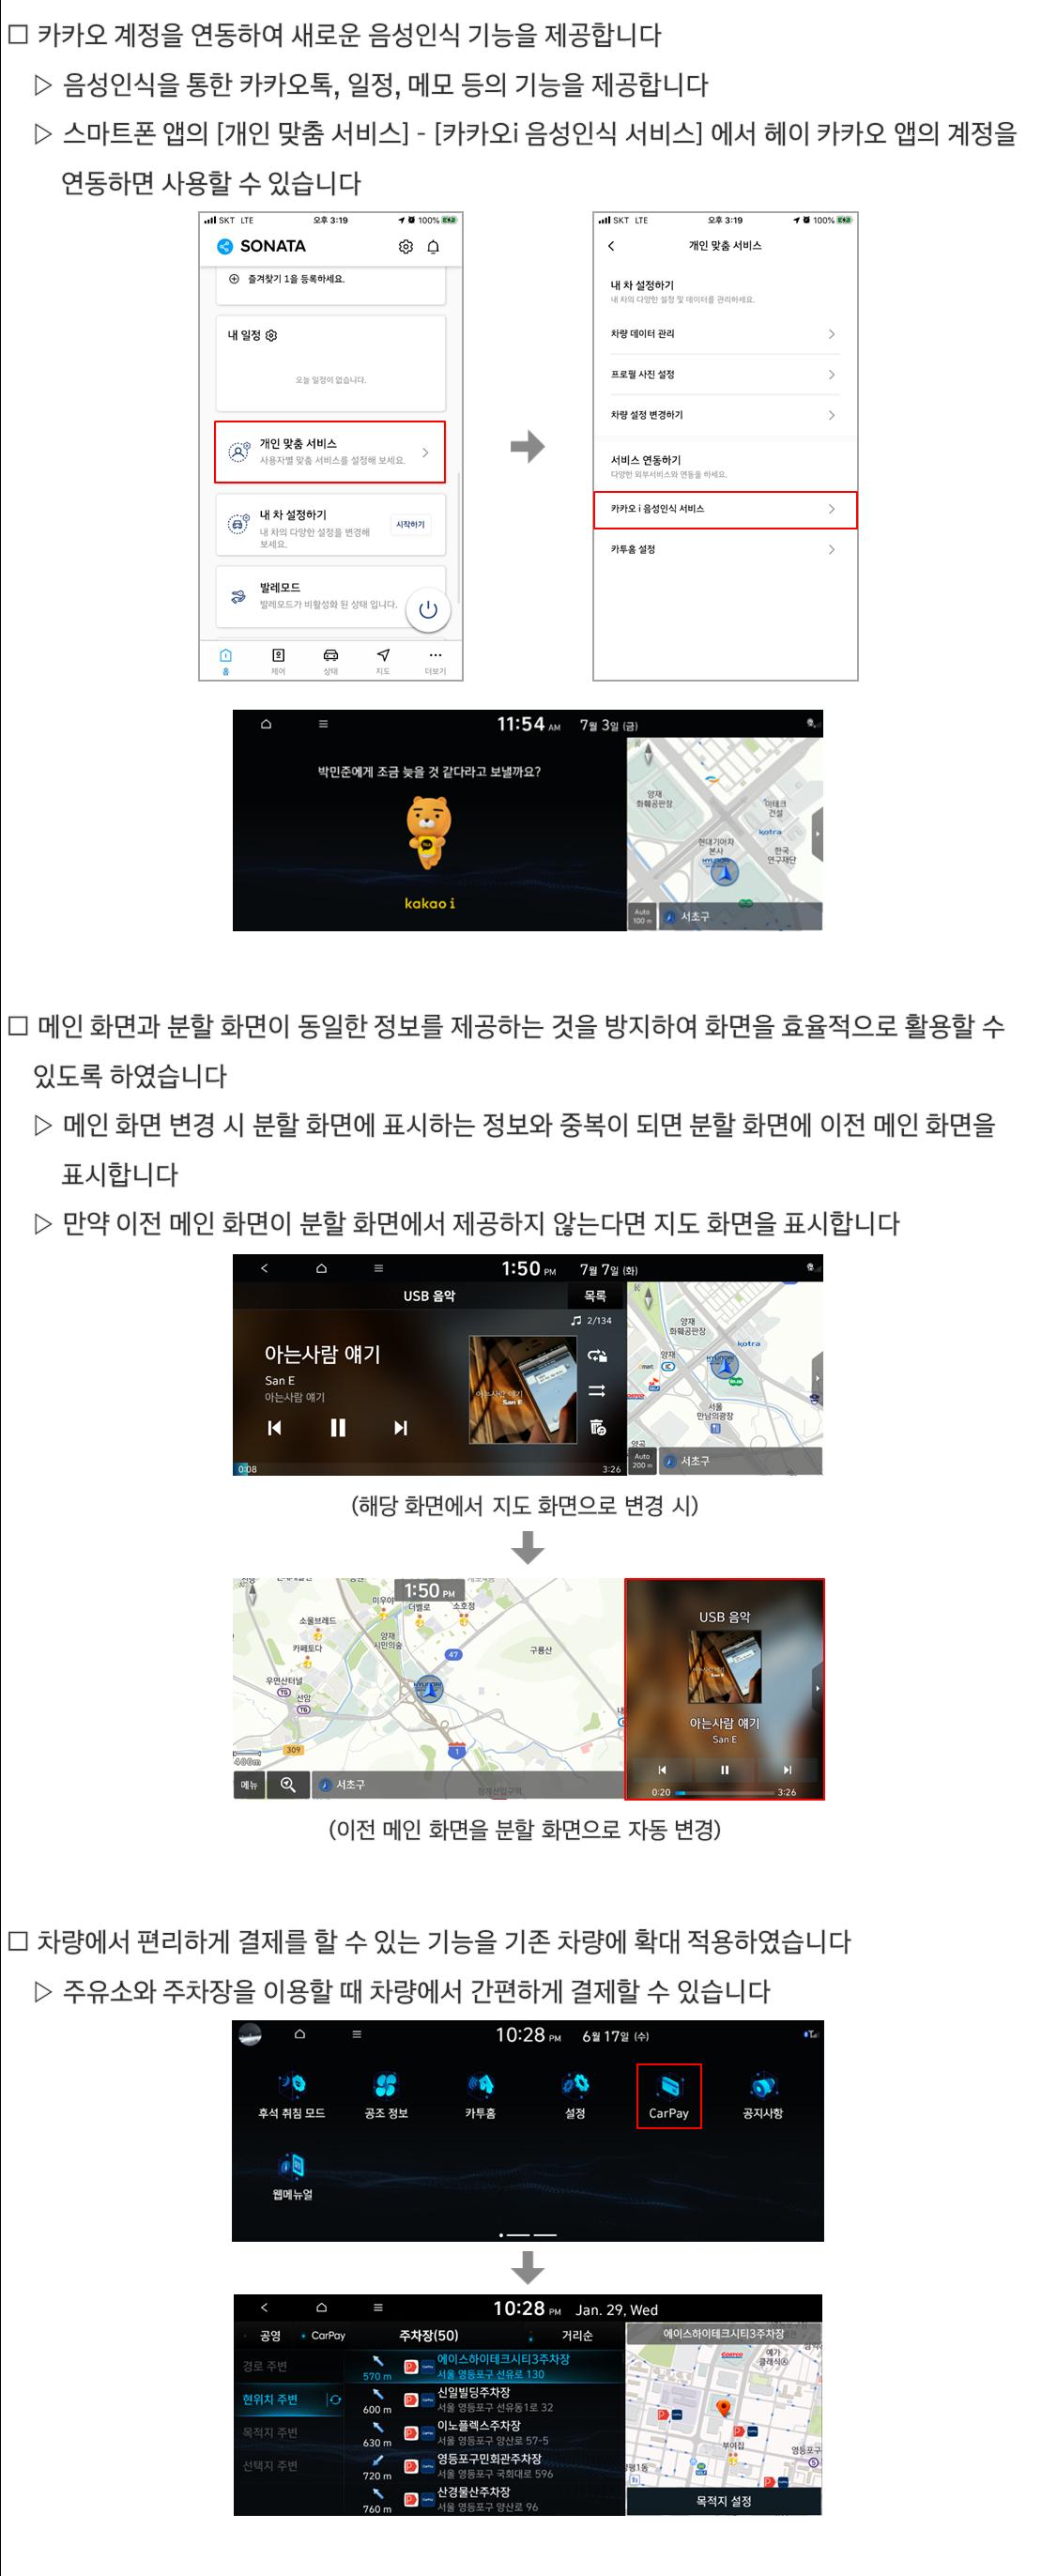 hd_04_updateinfo2.png